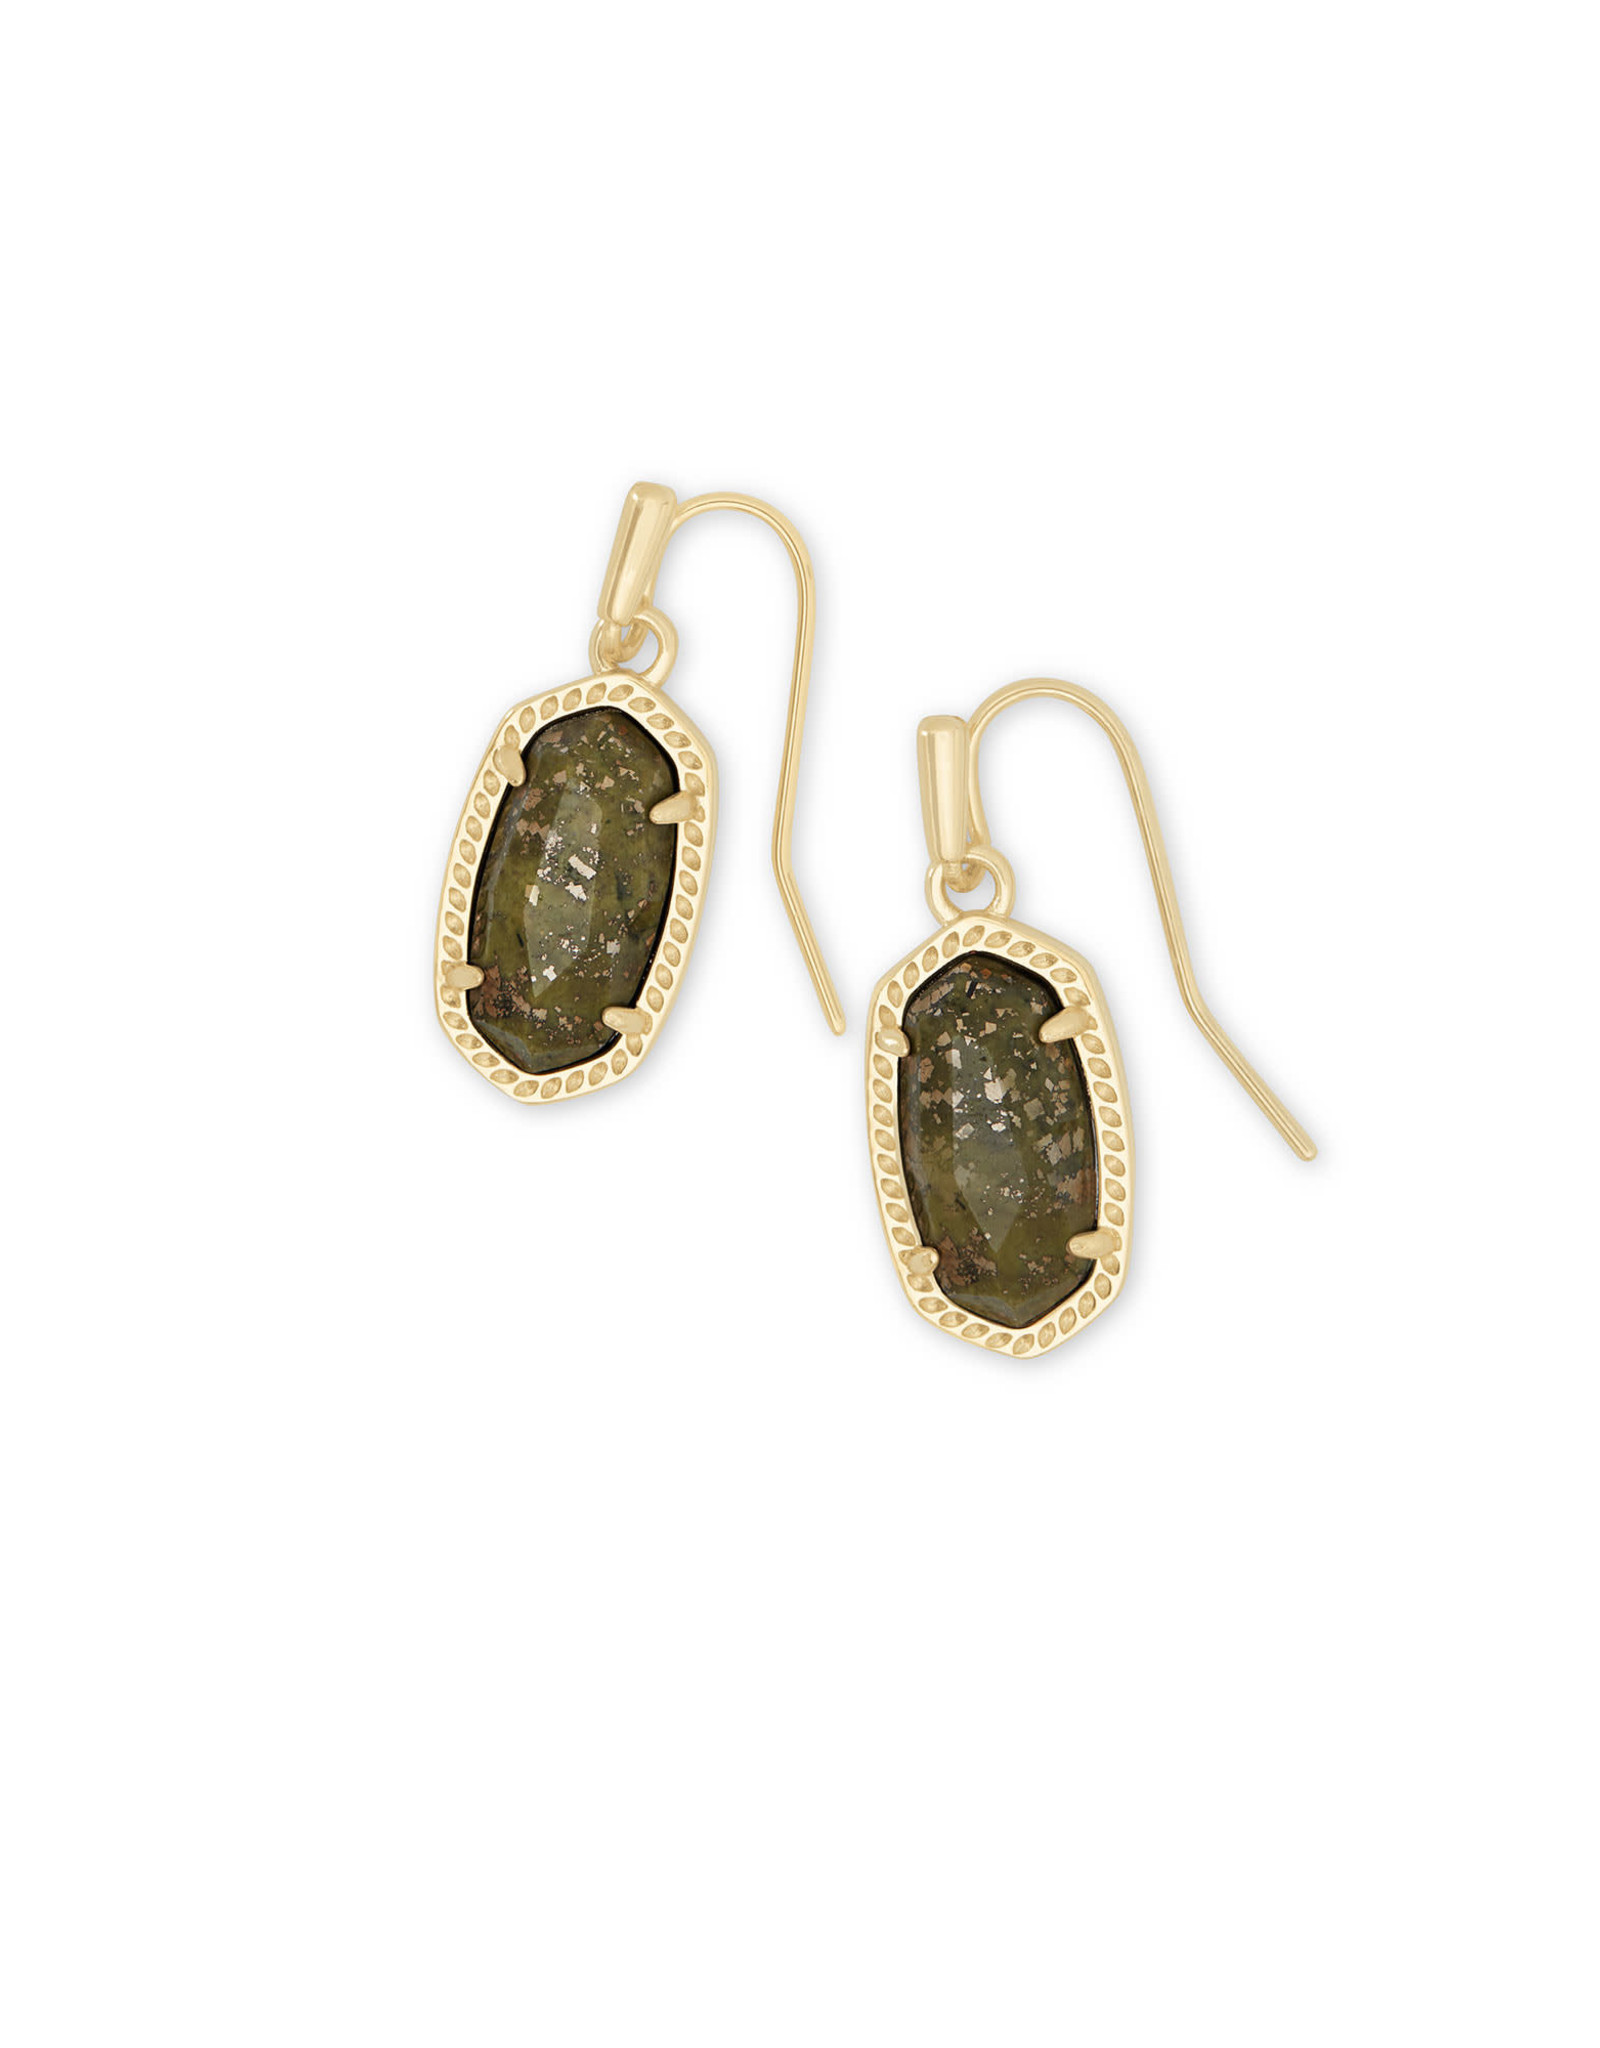 Kendra Scott Lee Earring - Olive Epidote/Gold